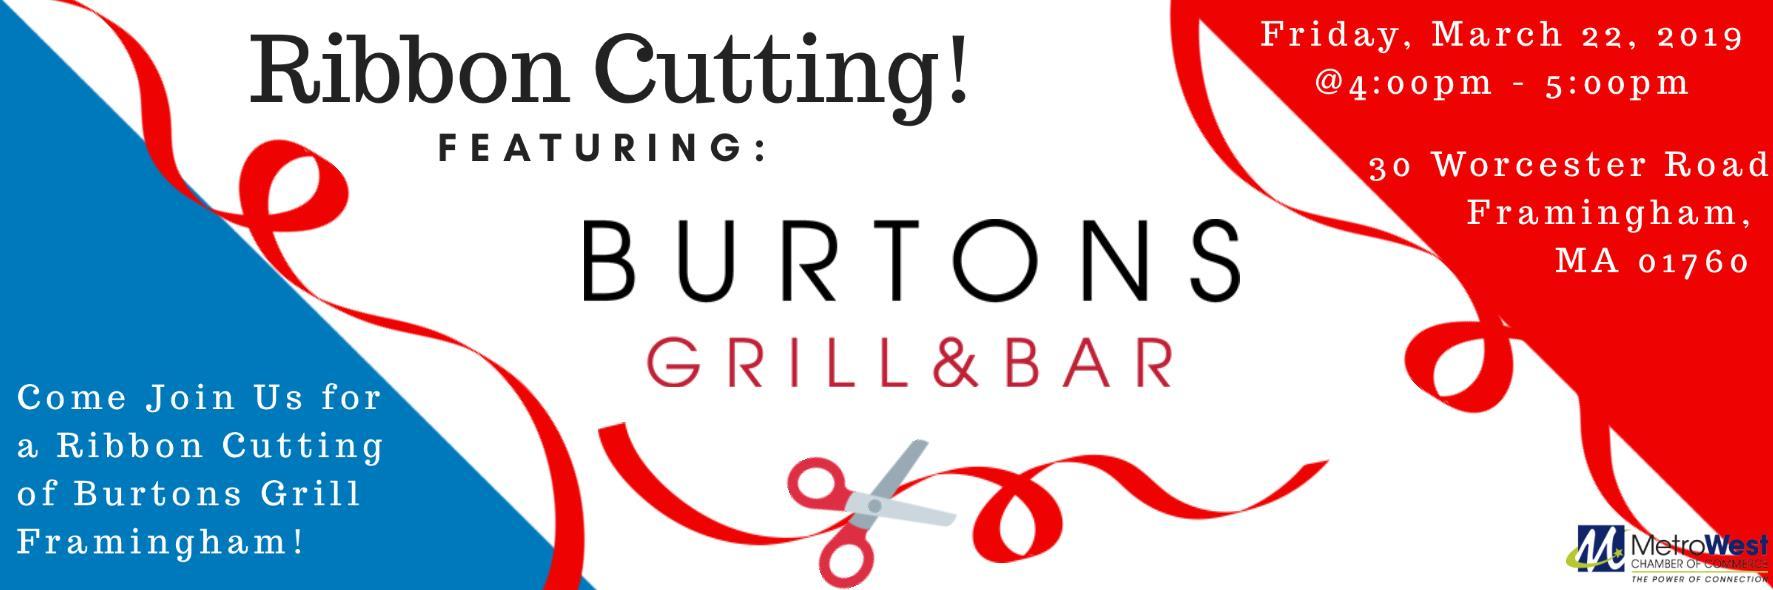 RC-Burtons-Grill-Banner.jpeg